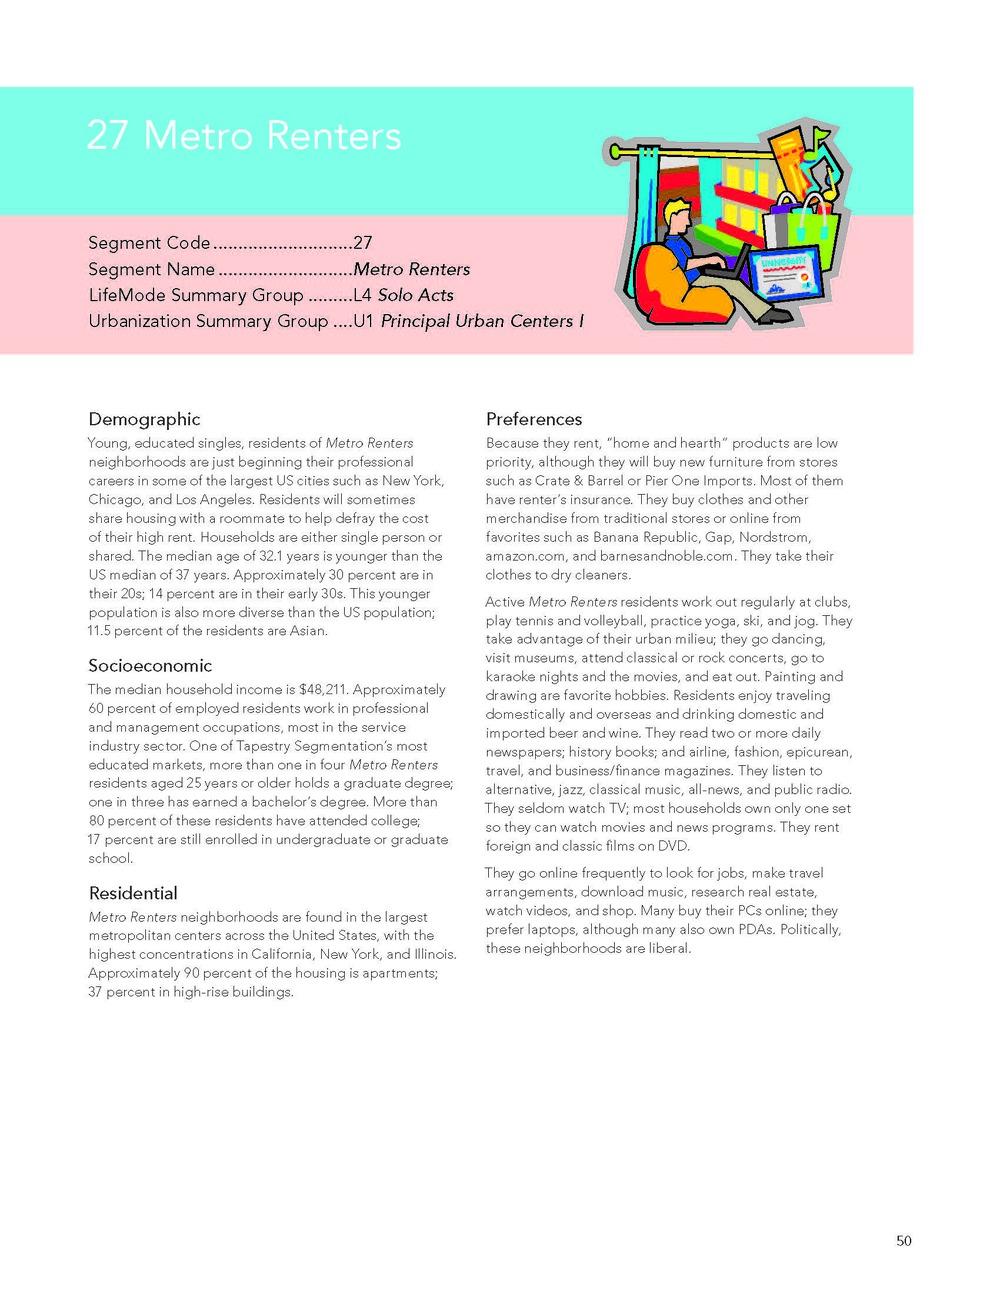 tapestry-segmentation_Page_53.jpg